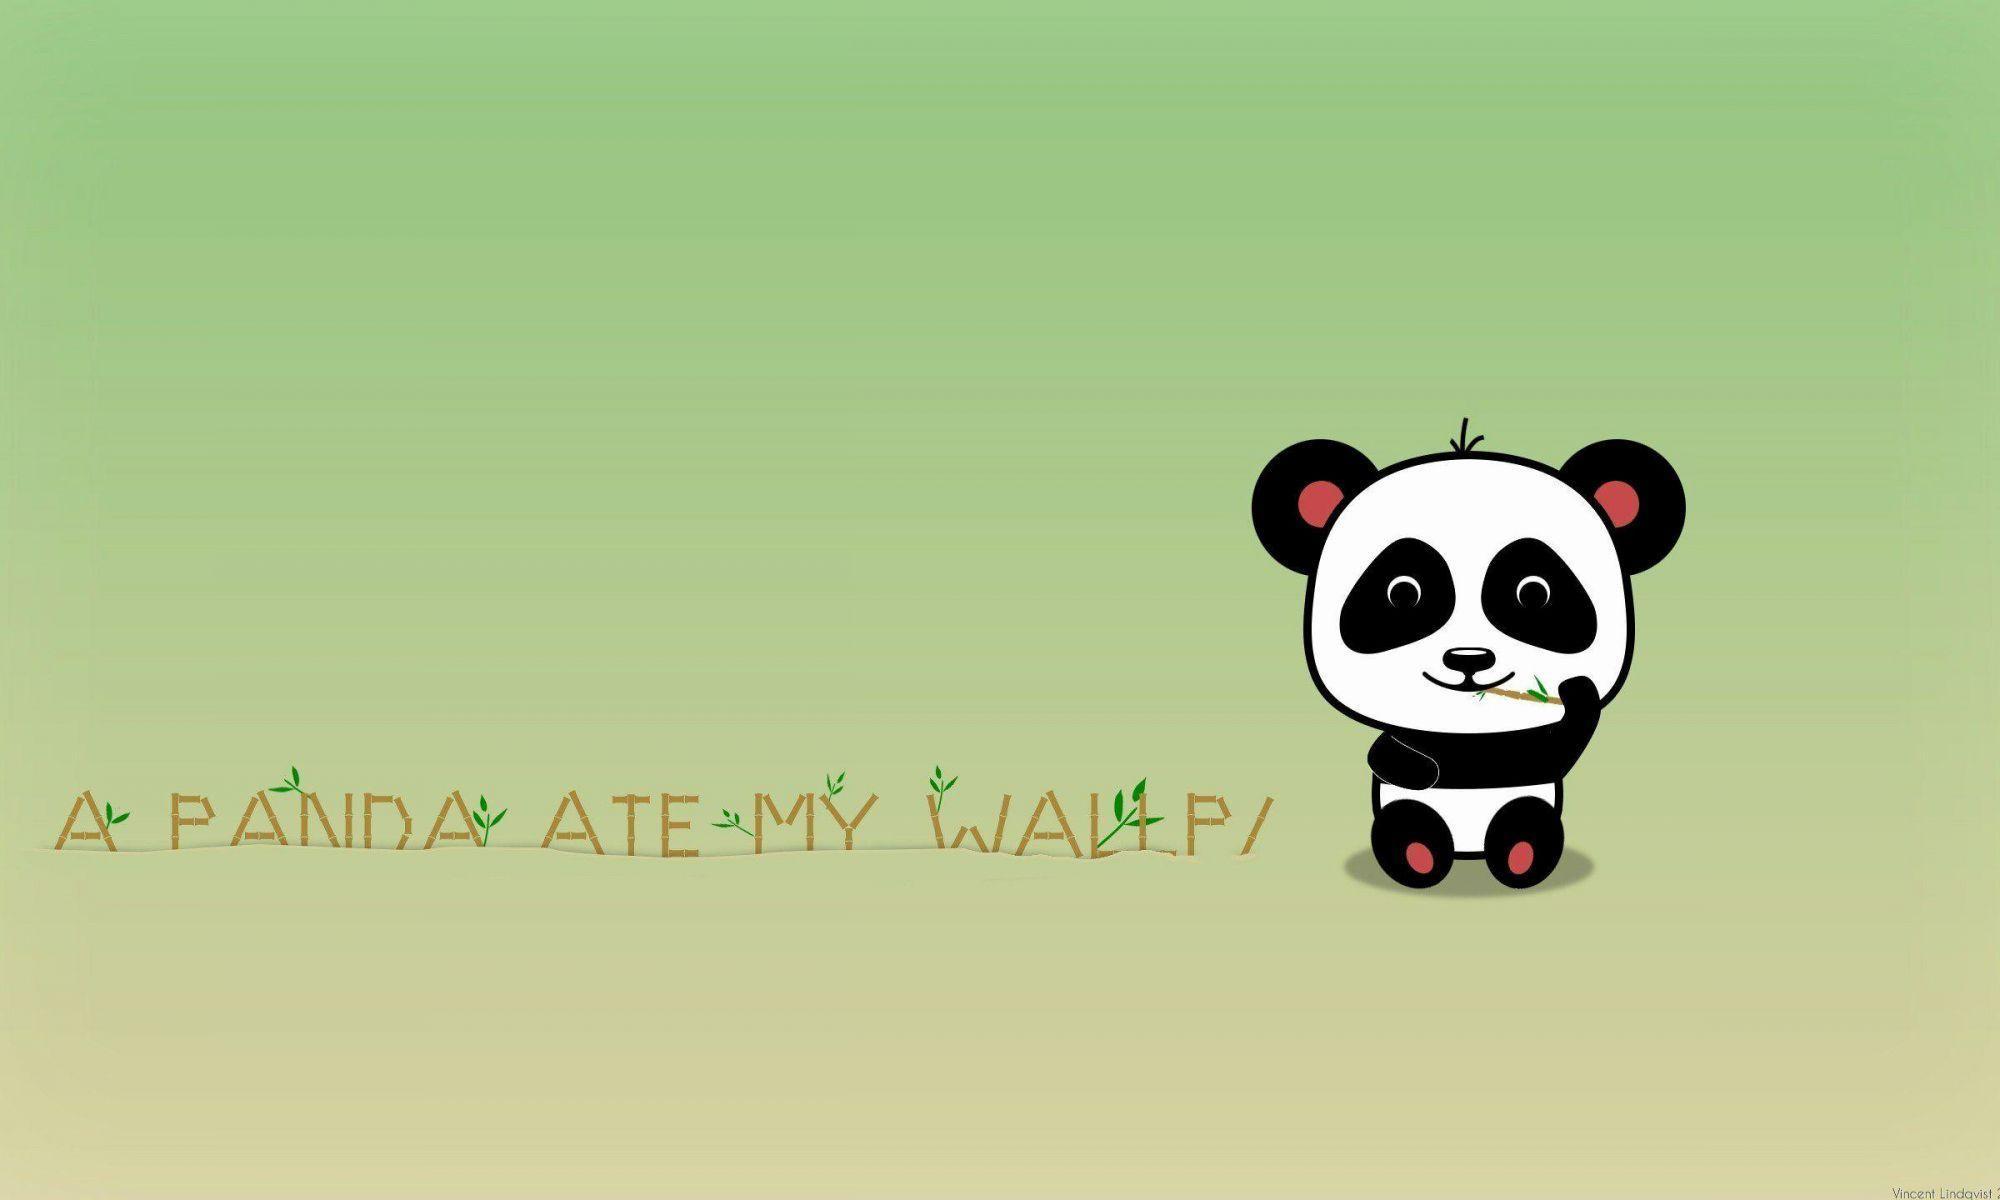 Cartoon Panda Wallpapers Top Free Cartoon Panda Backgrounds Wallpaperaccess